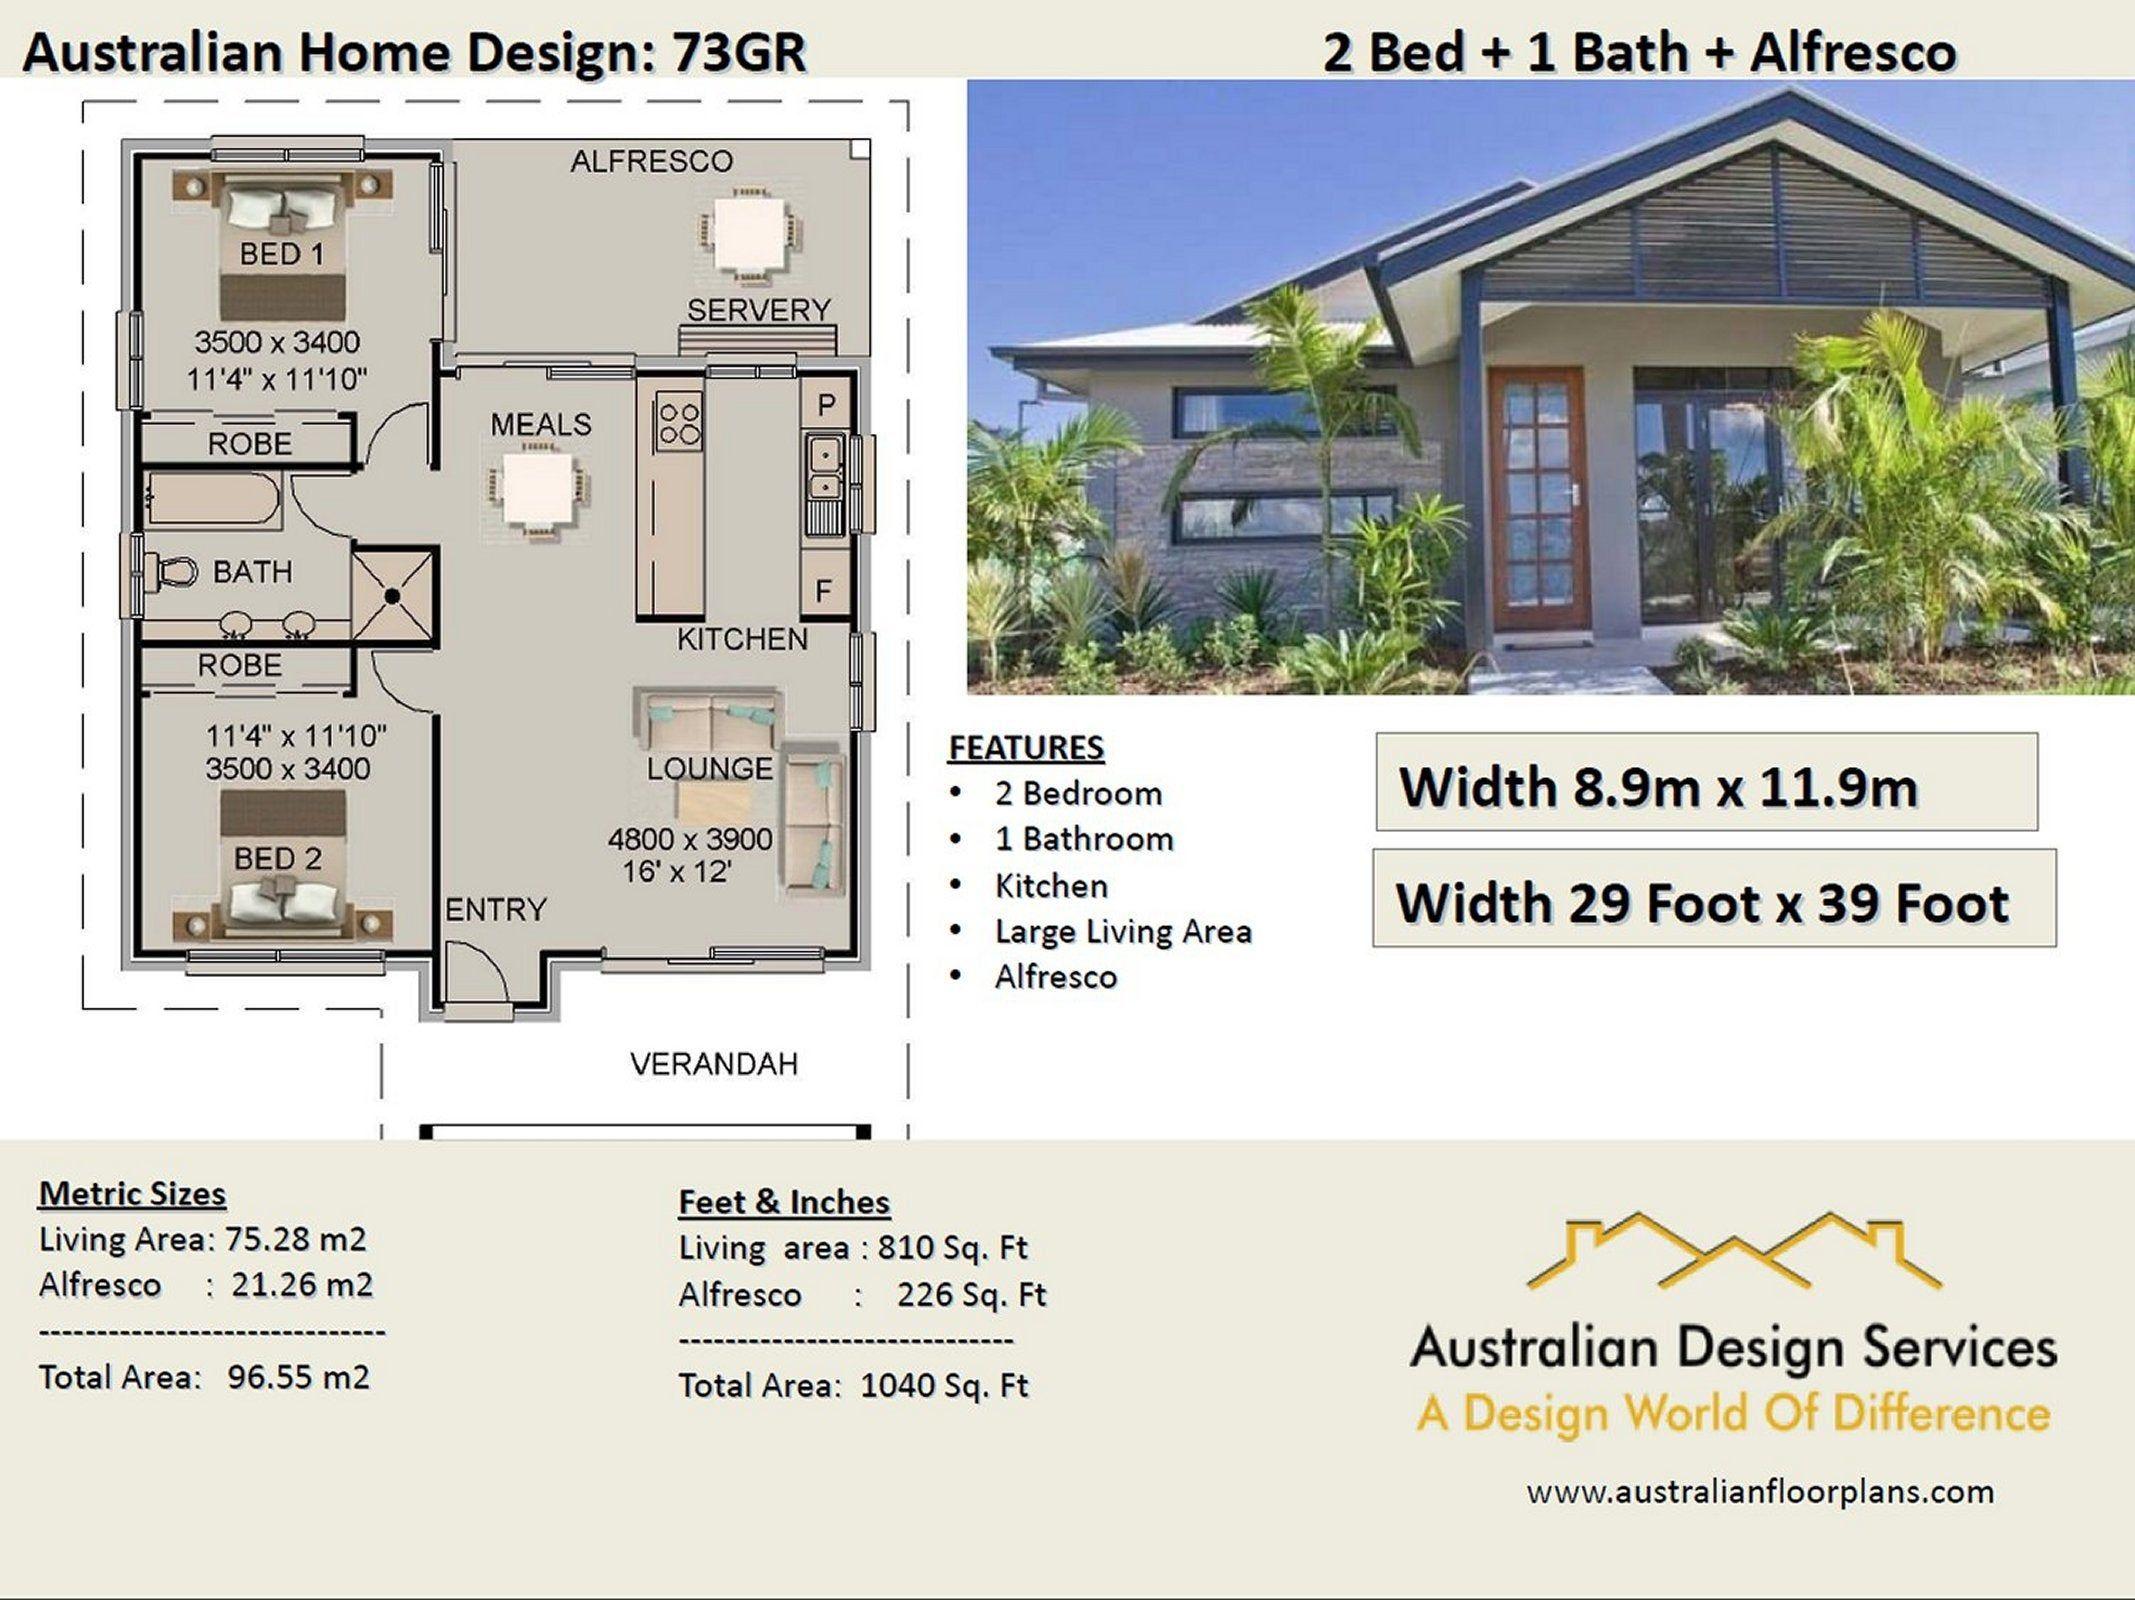 Granny Flat Home Design 2 Bedroom Alfresco Concept Floor Plans For Sale 1040 Sq Feet O Small Beach House Plans House Plans Australia Small Beach Houses